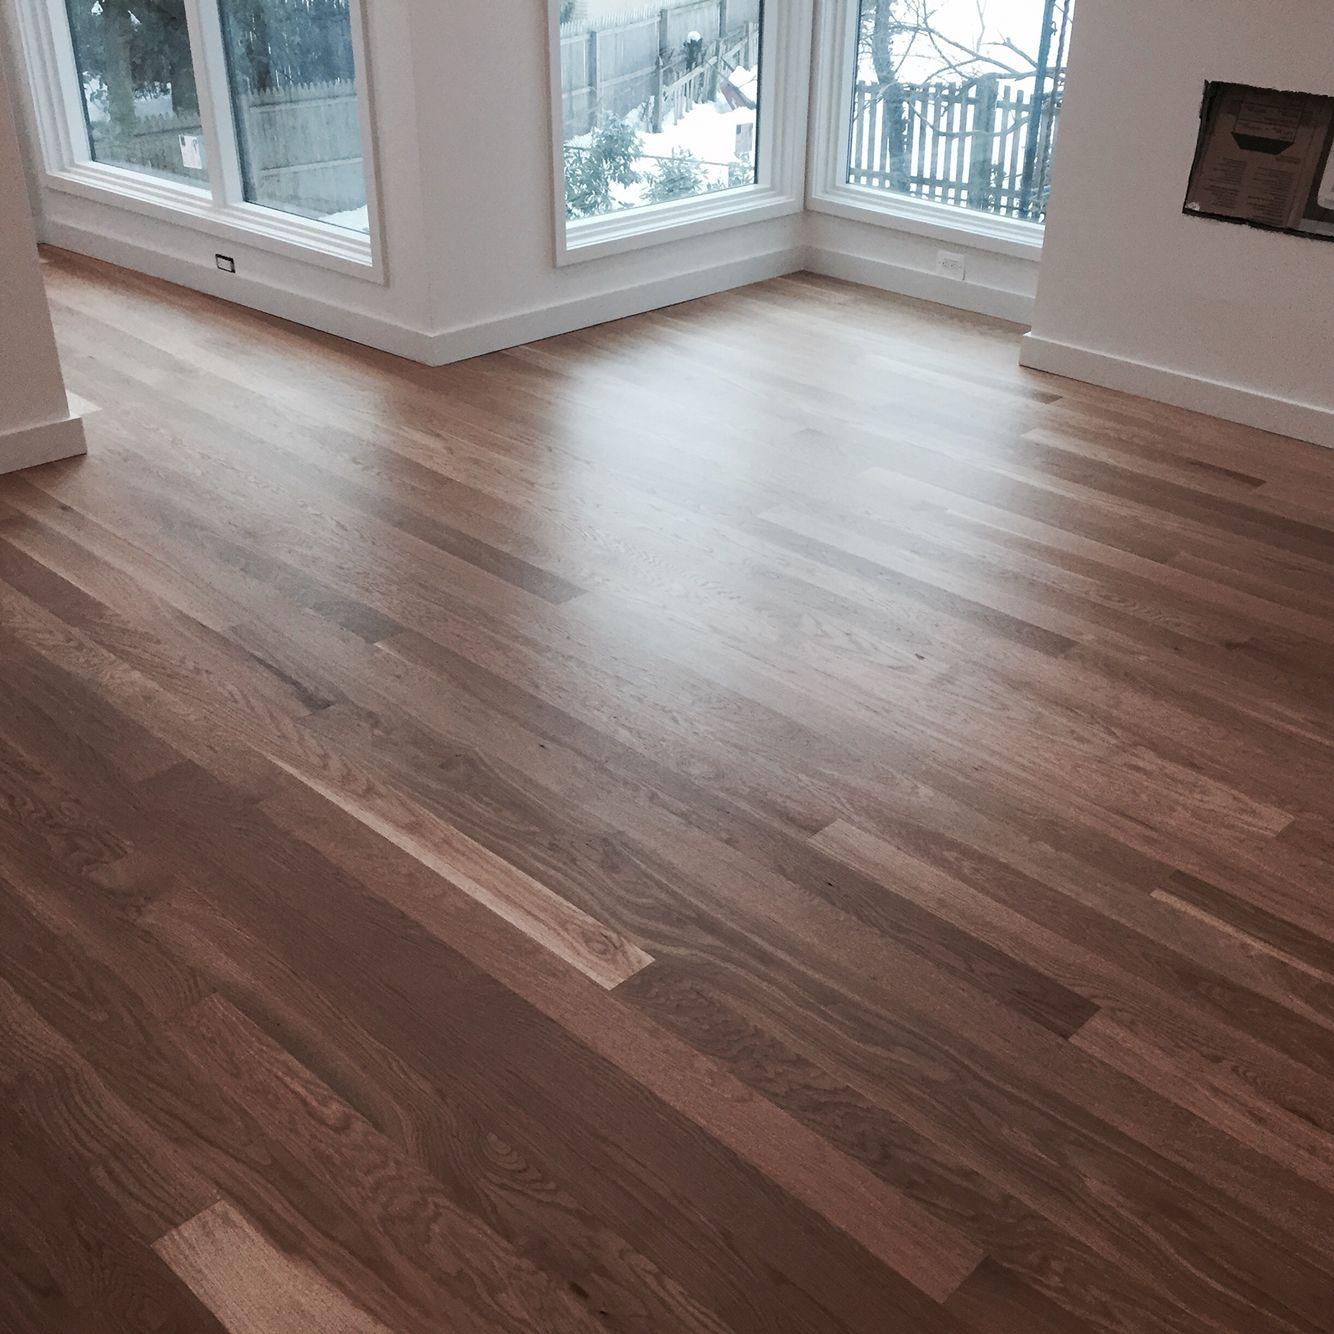 Wood Floor Stain Colors 2020